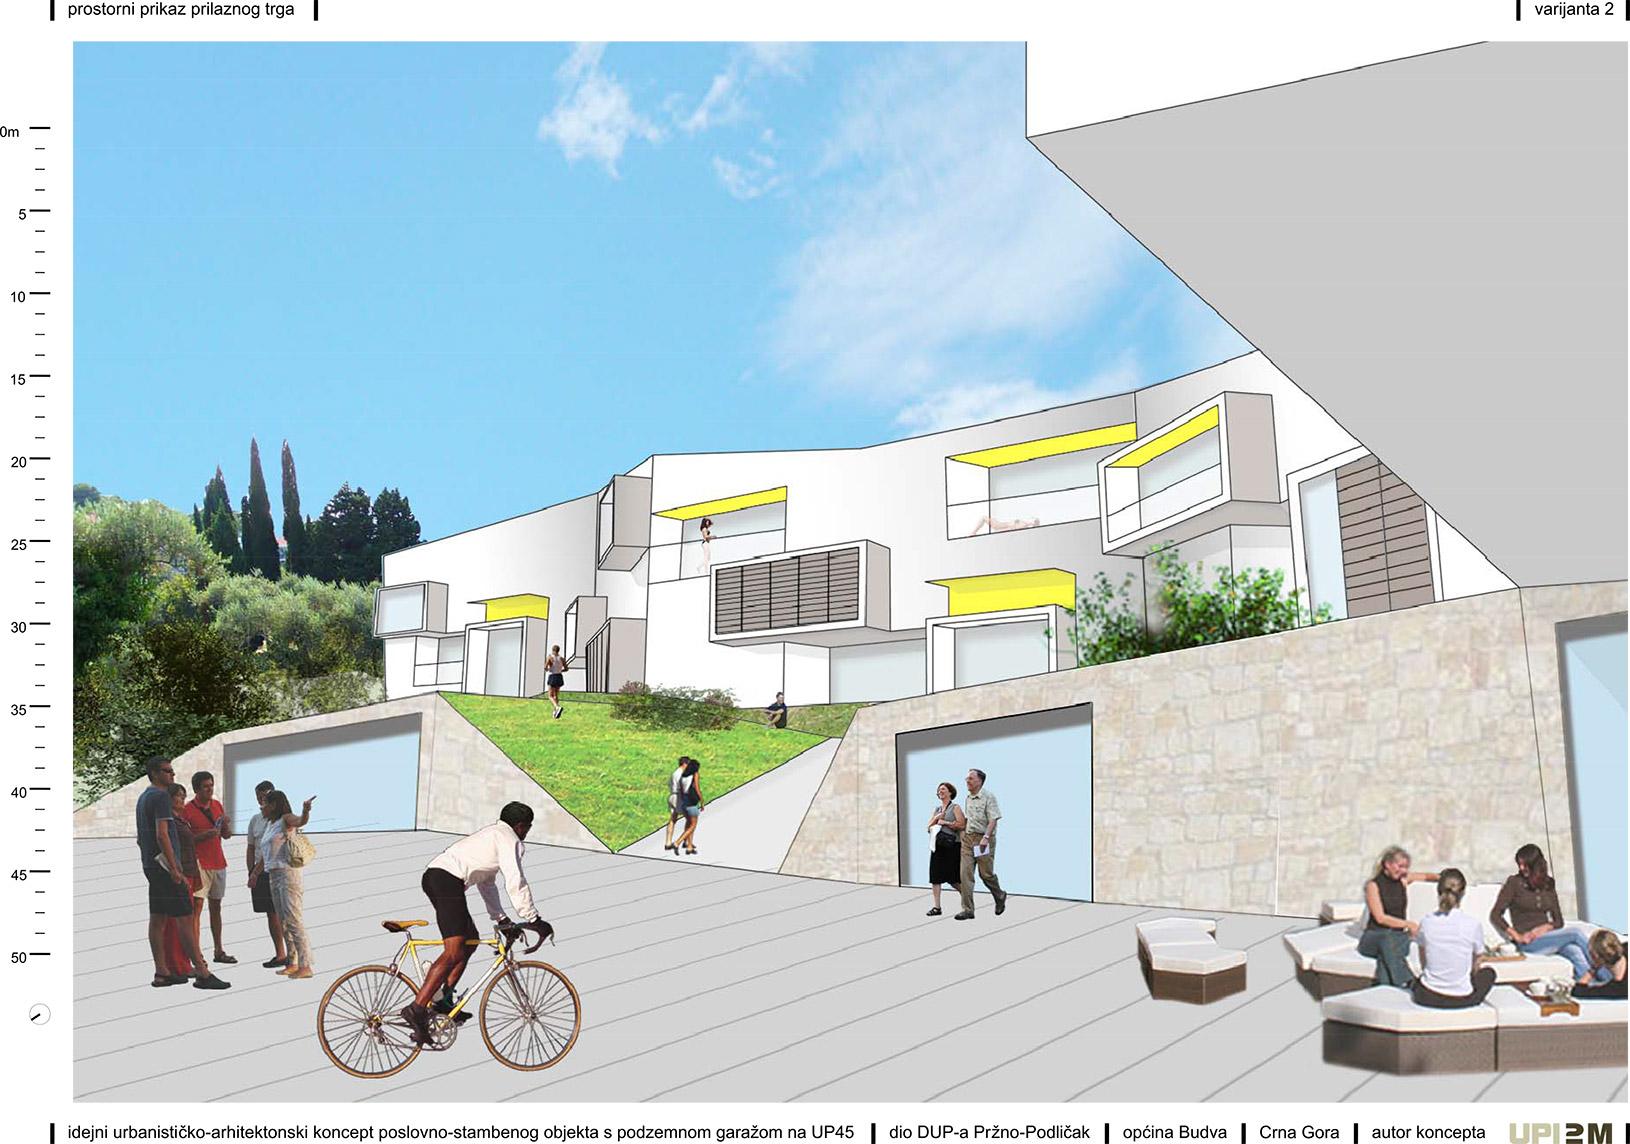 pržno-podličak, budva, montenegro, crna gora, upi-2m, architecture, arhitektura